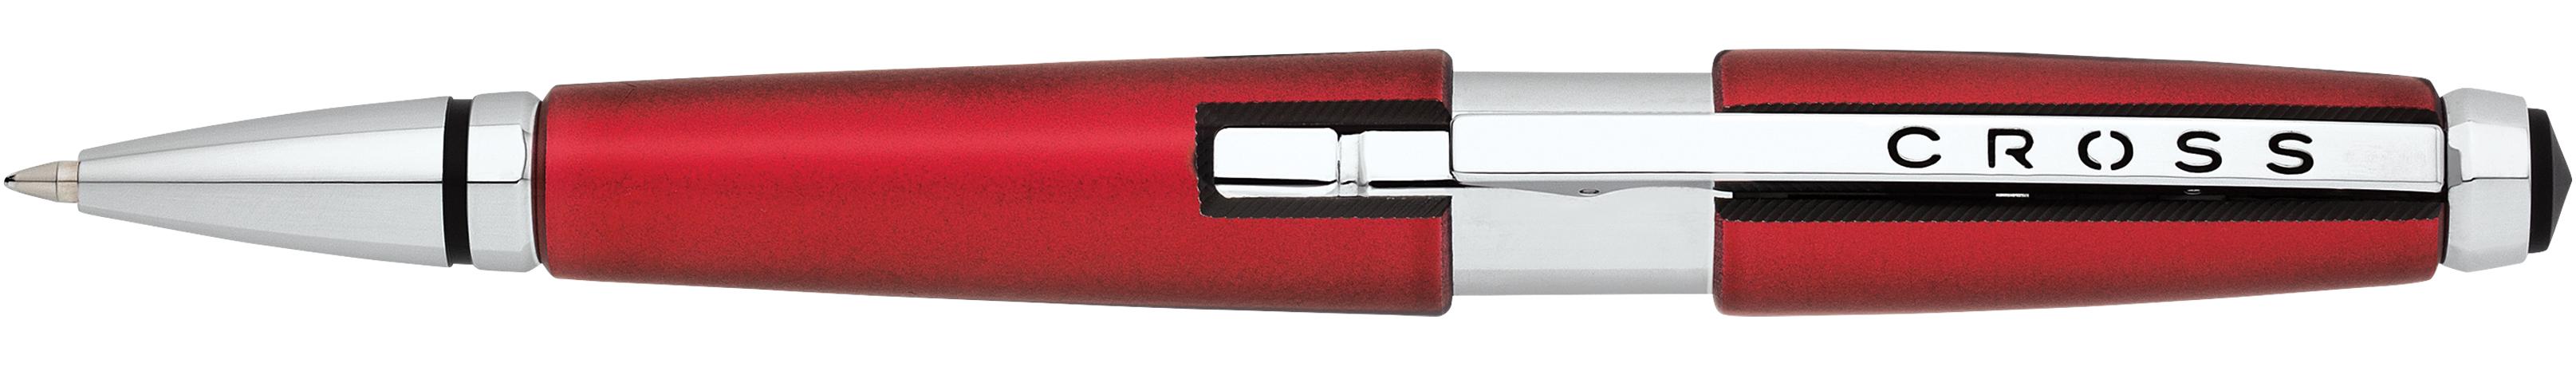 Cross Edge Red Gel Ink Pen (Self-Serve box)